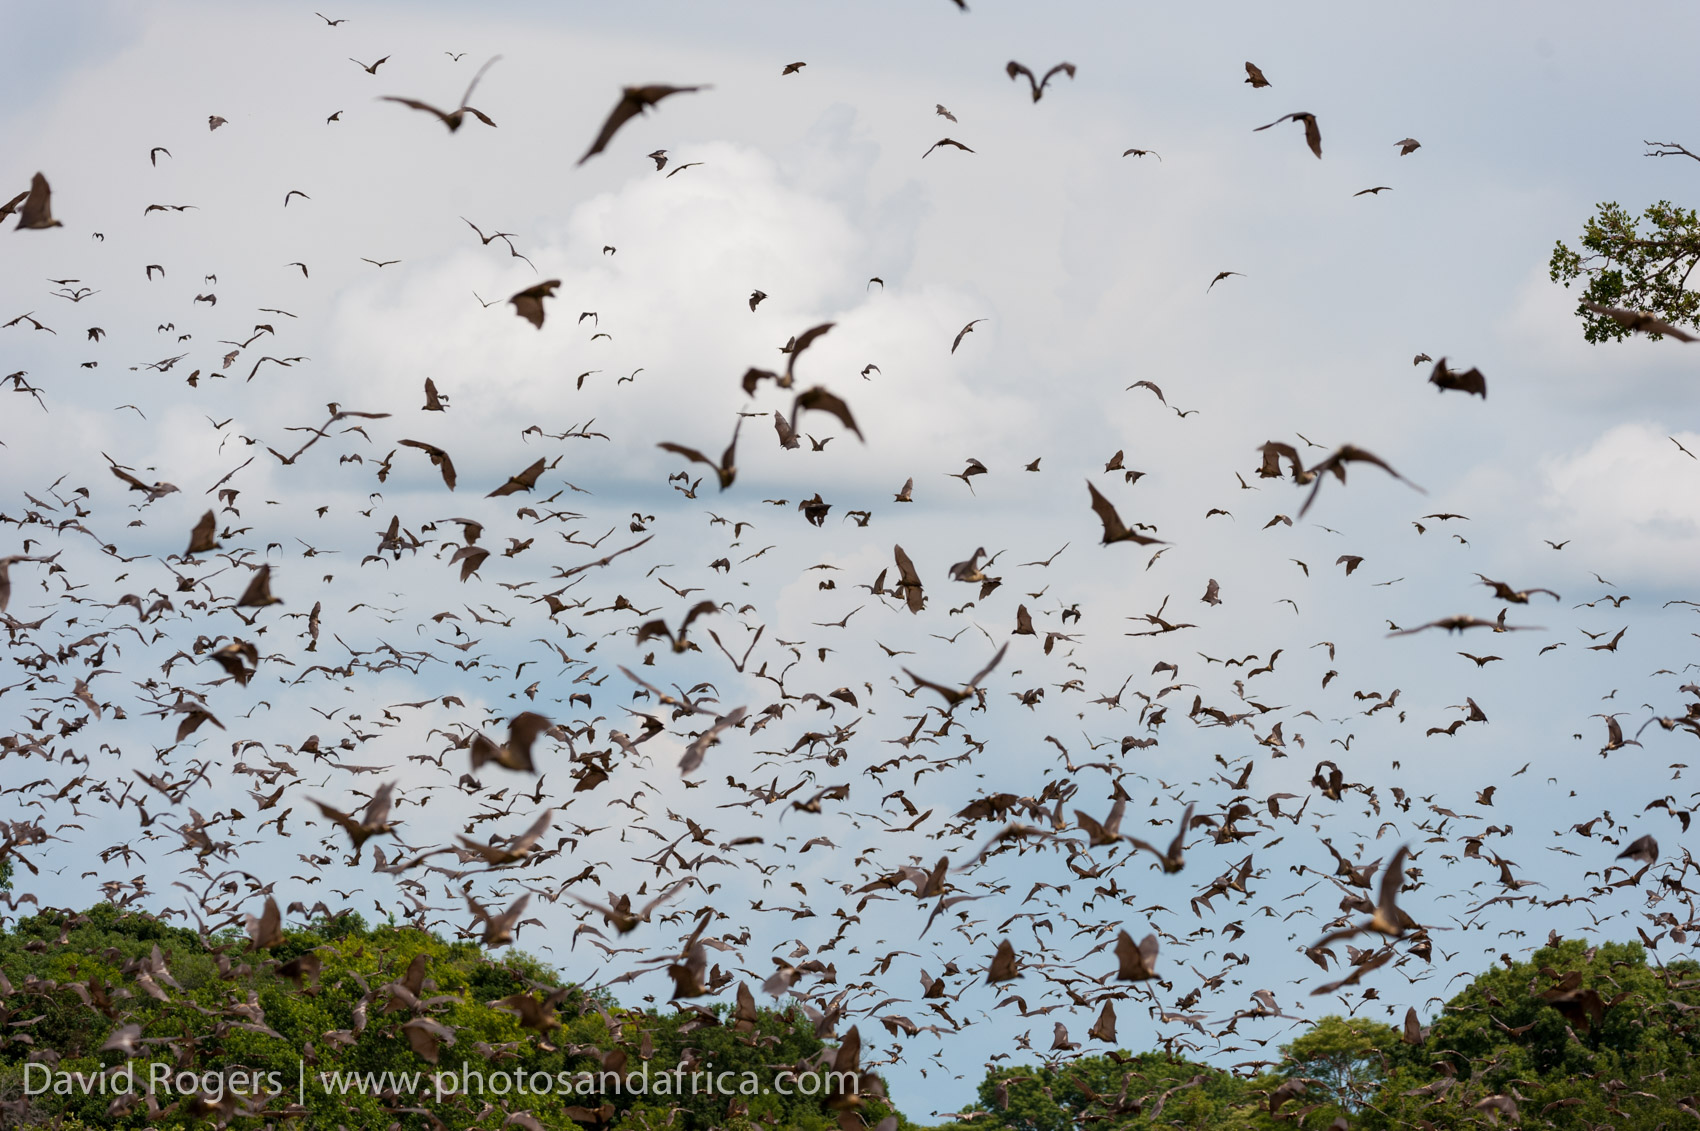 Kasanka fruit bat migration